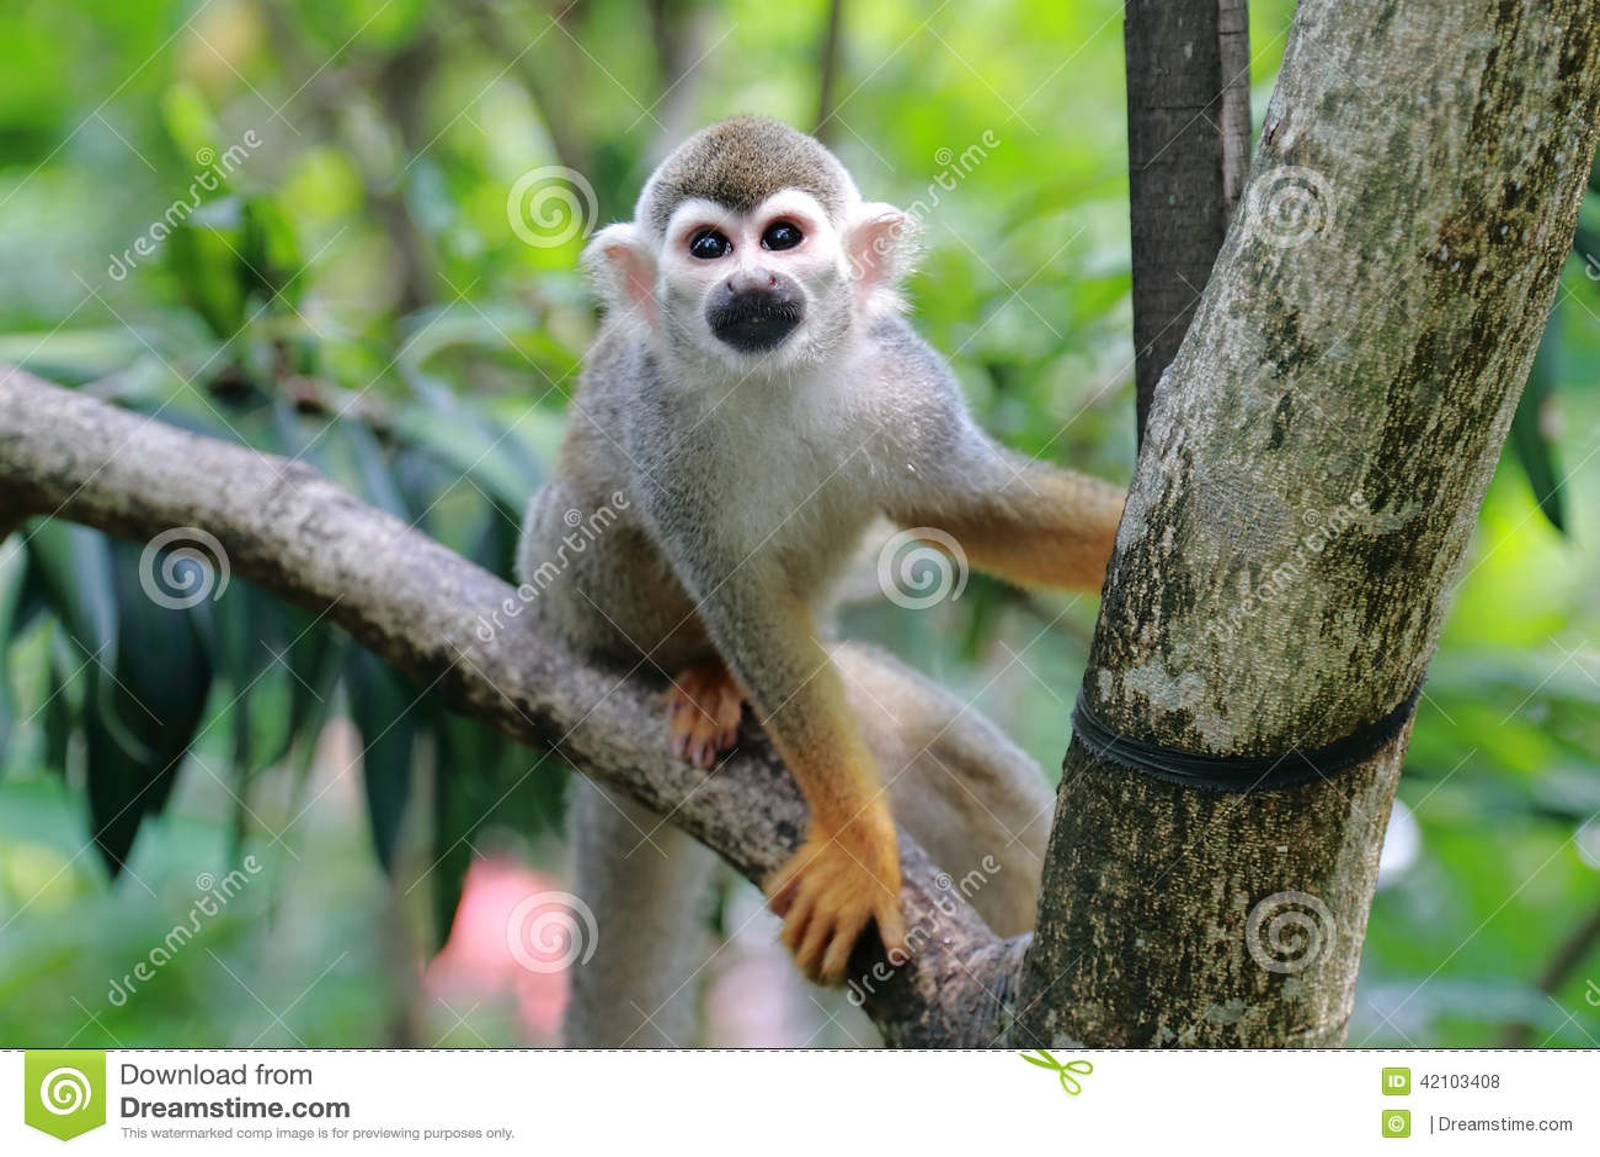 Squirrel monkeys in trees - photo#46